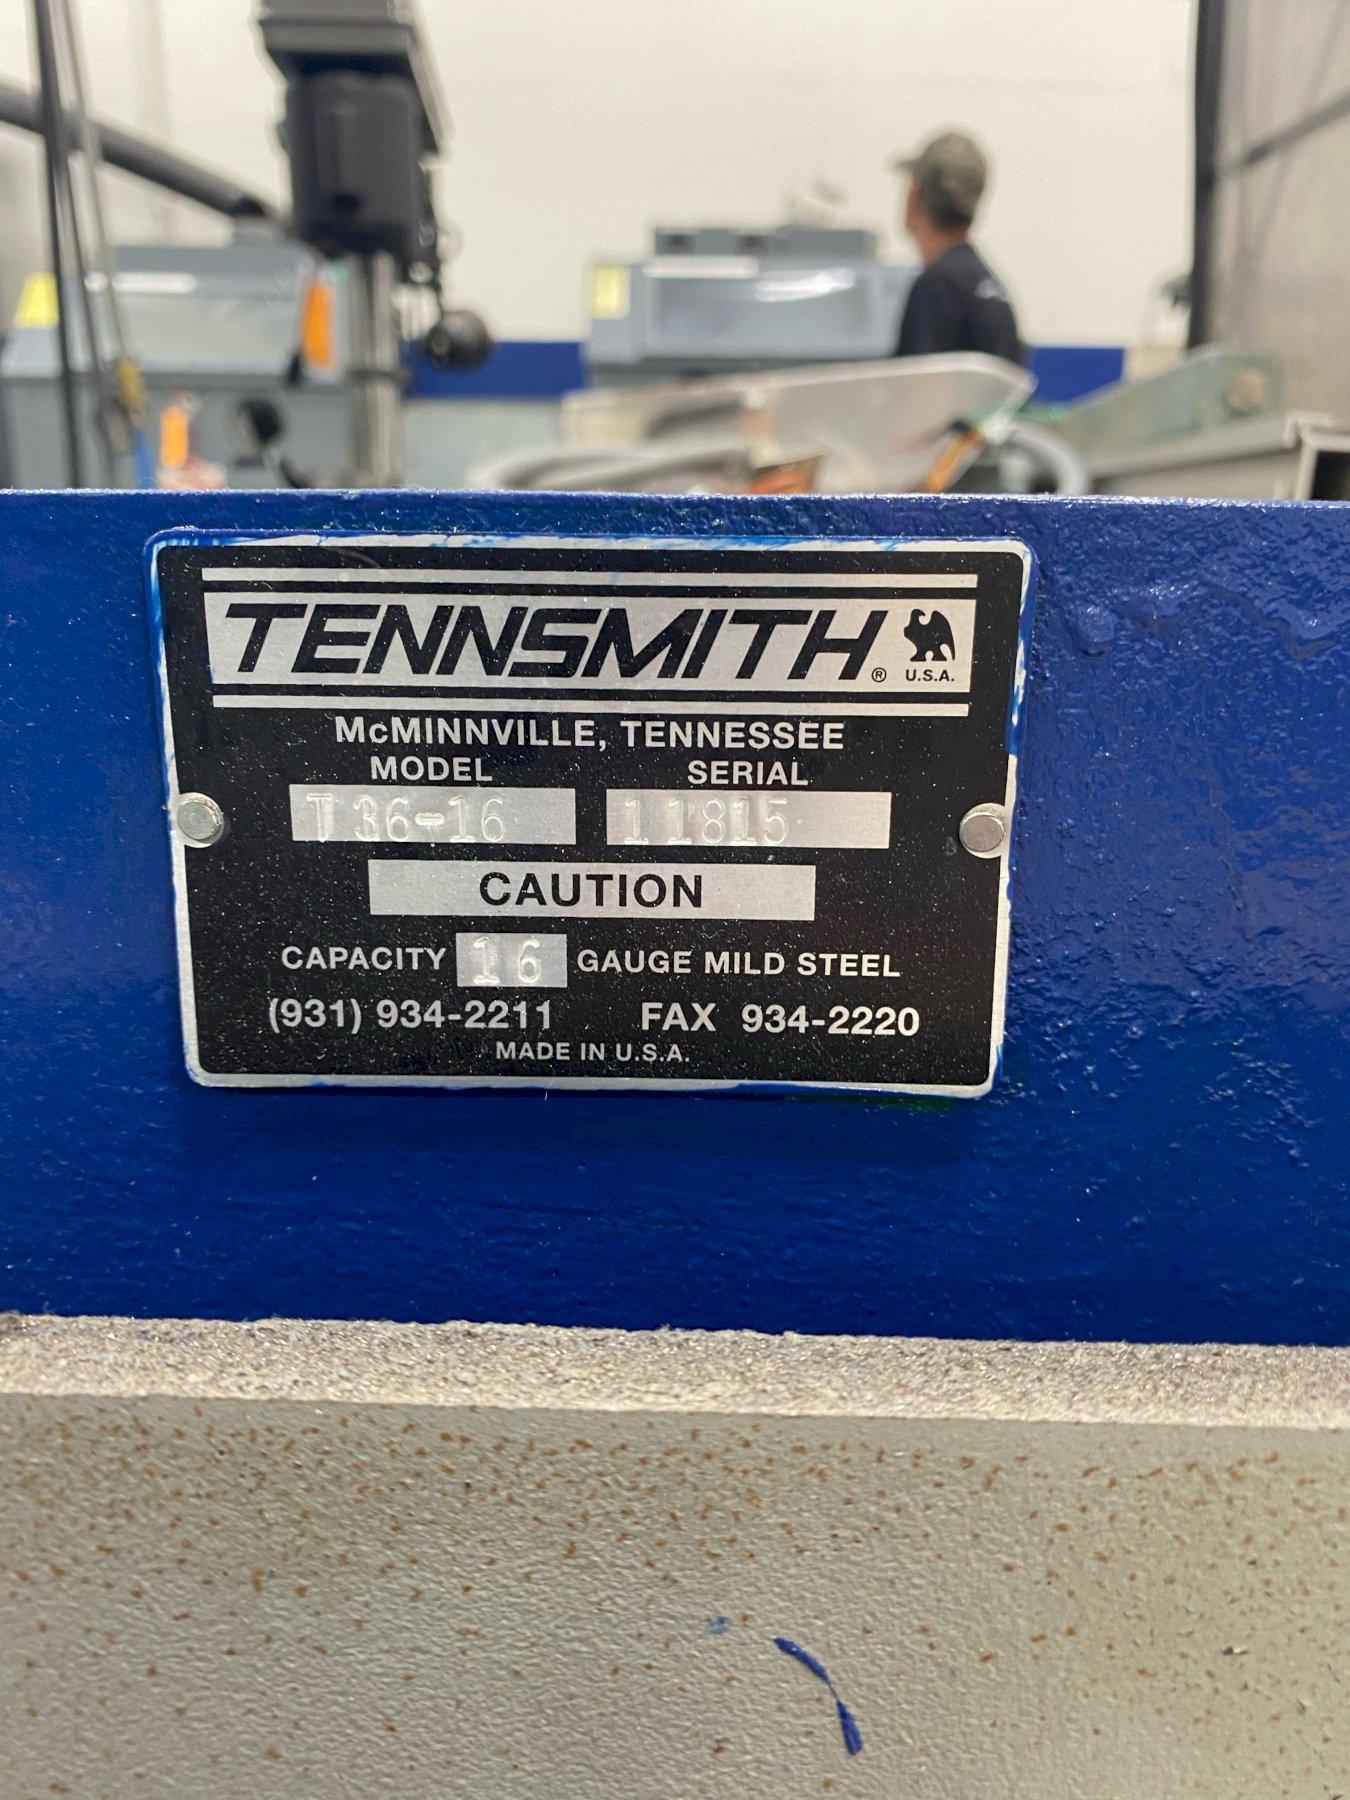 Tennsmith 16-gauge Foot Shear Model T36-16